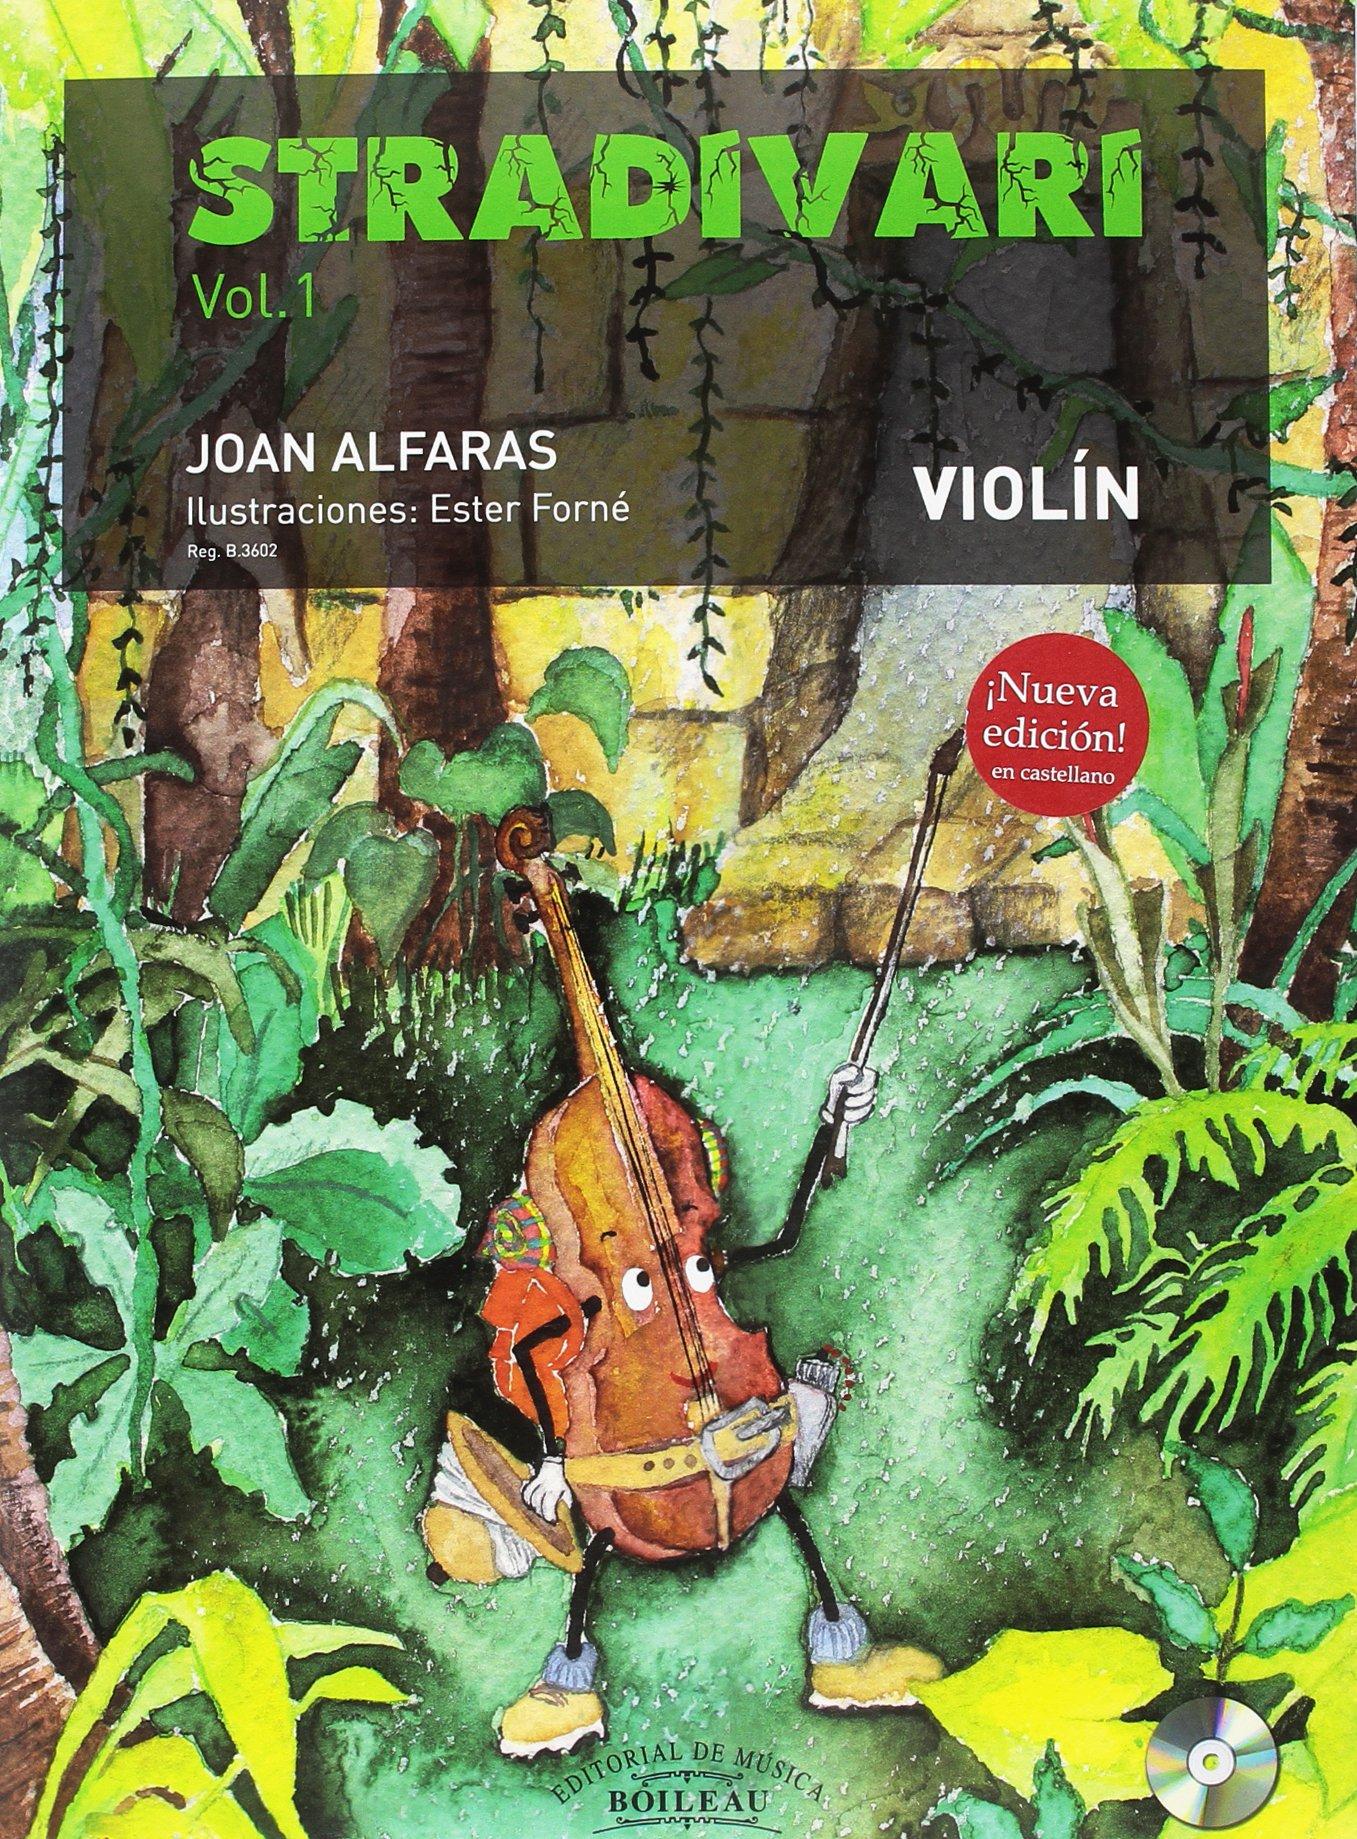 Stradivari vol. 1 - Violín - B.3602 Tapa blanda – 1 ene 2000 Joan ALFARAS Boileau Editorial De Musica 8417199012